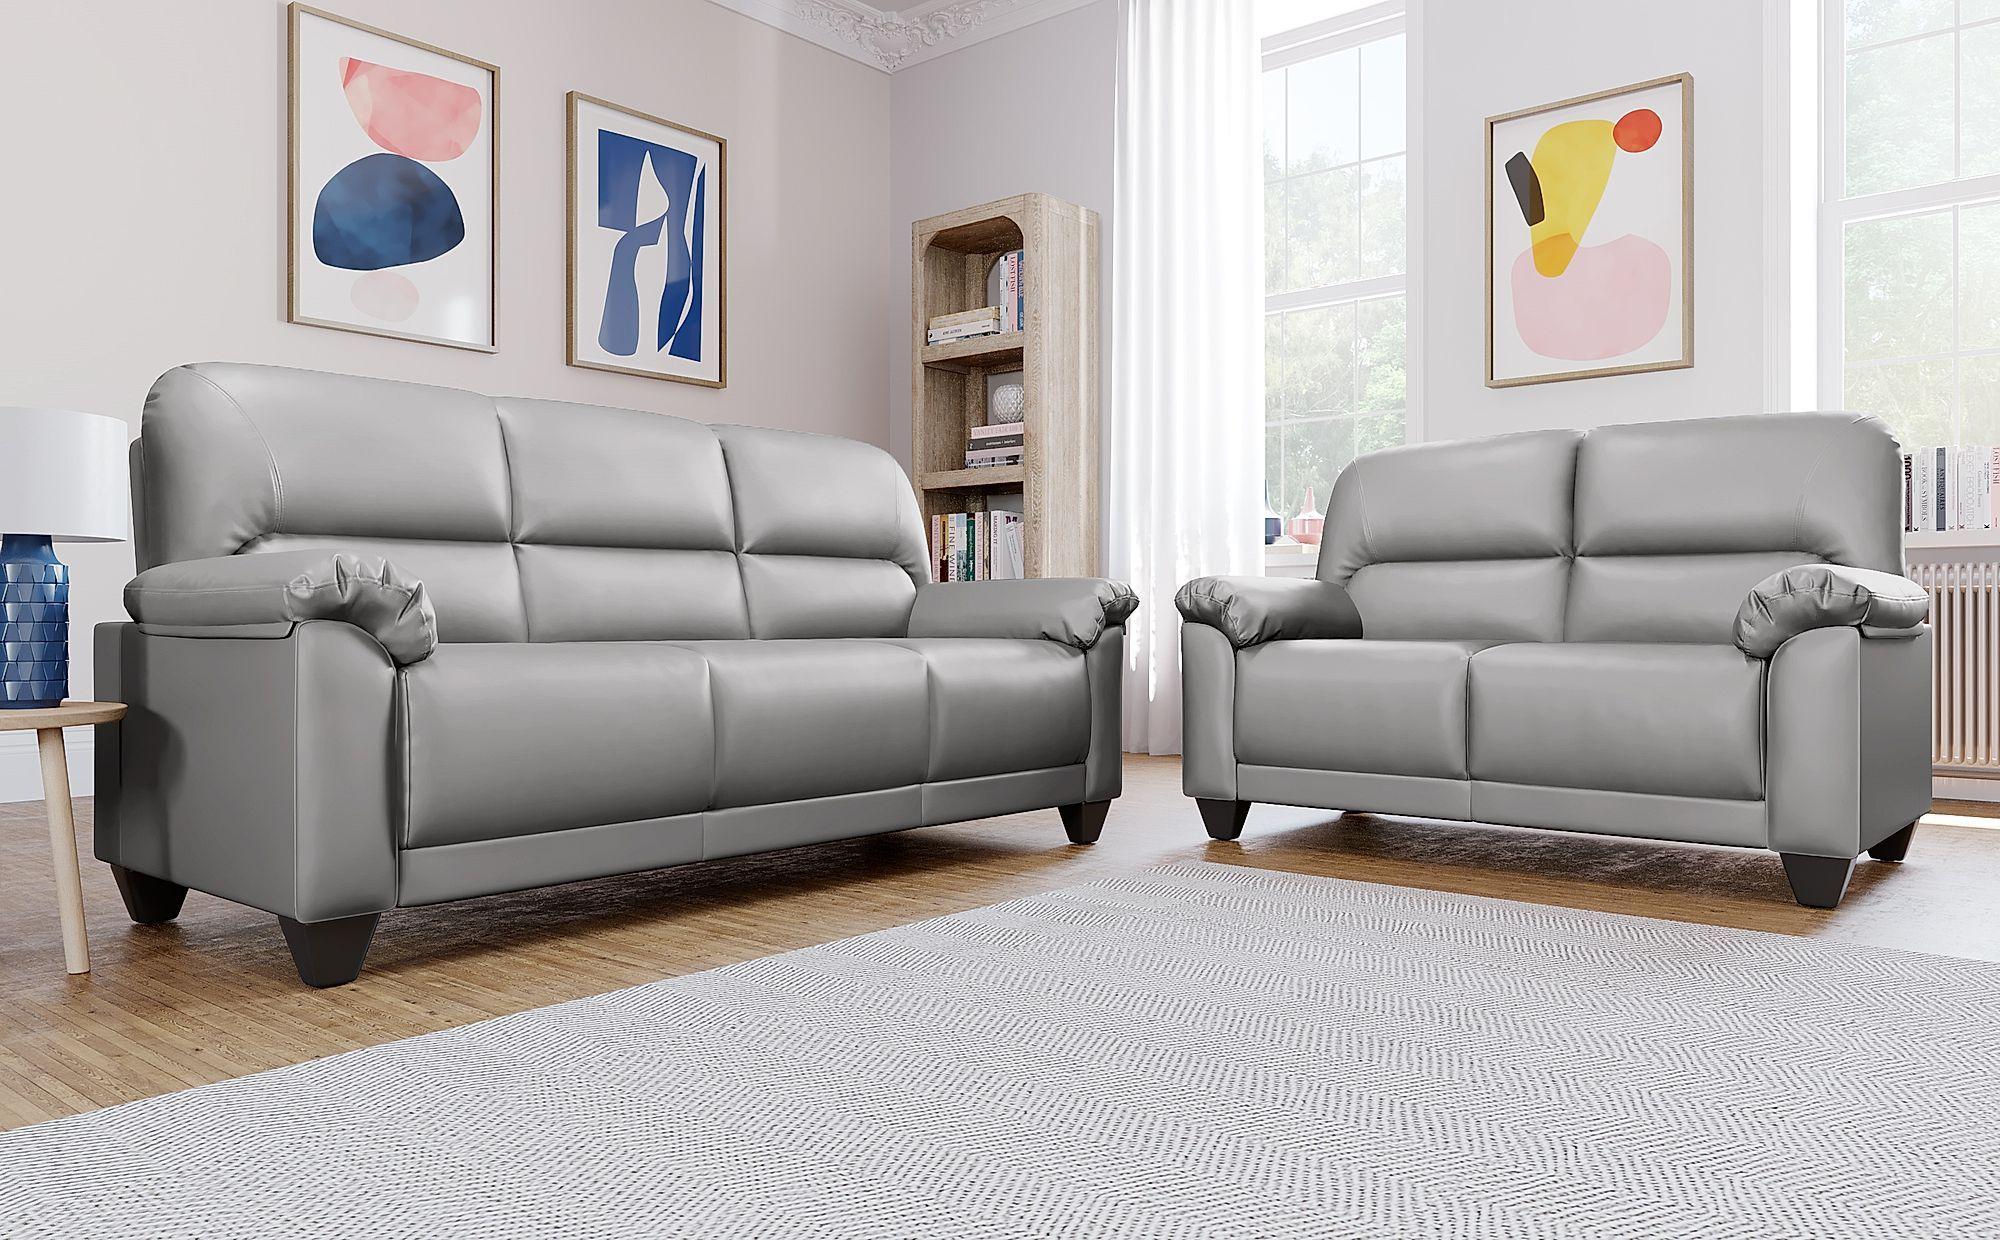 Kenton Small Light Grey Leather 3 2 Seater Sofa Set Grey Leather